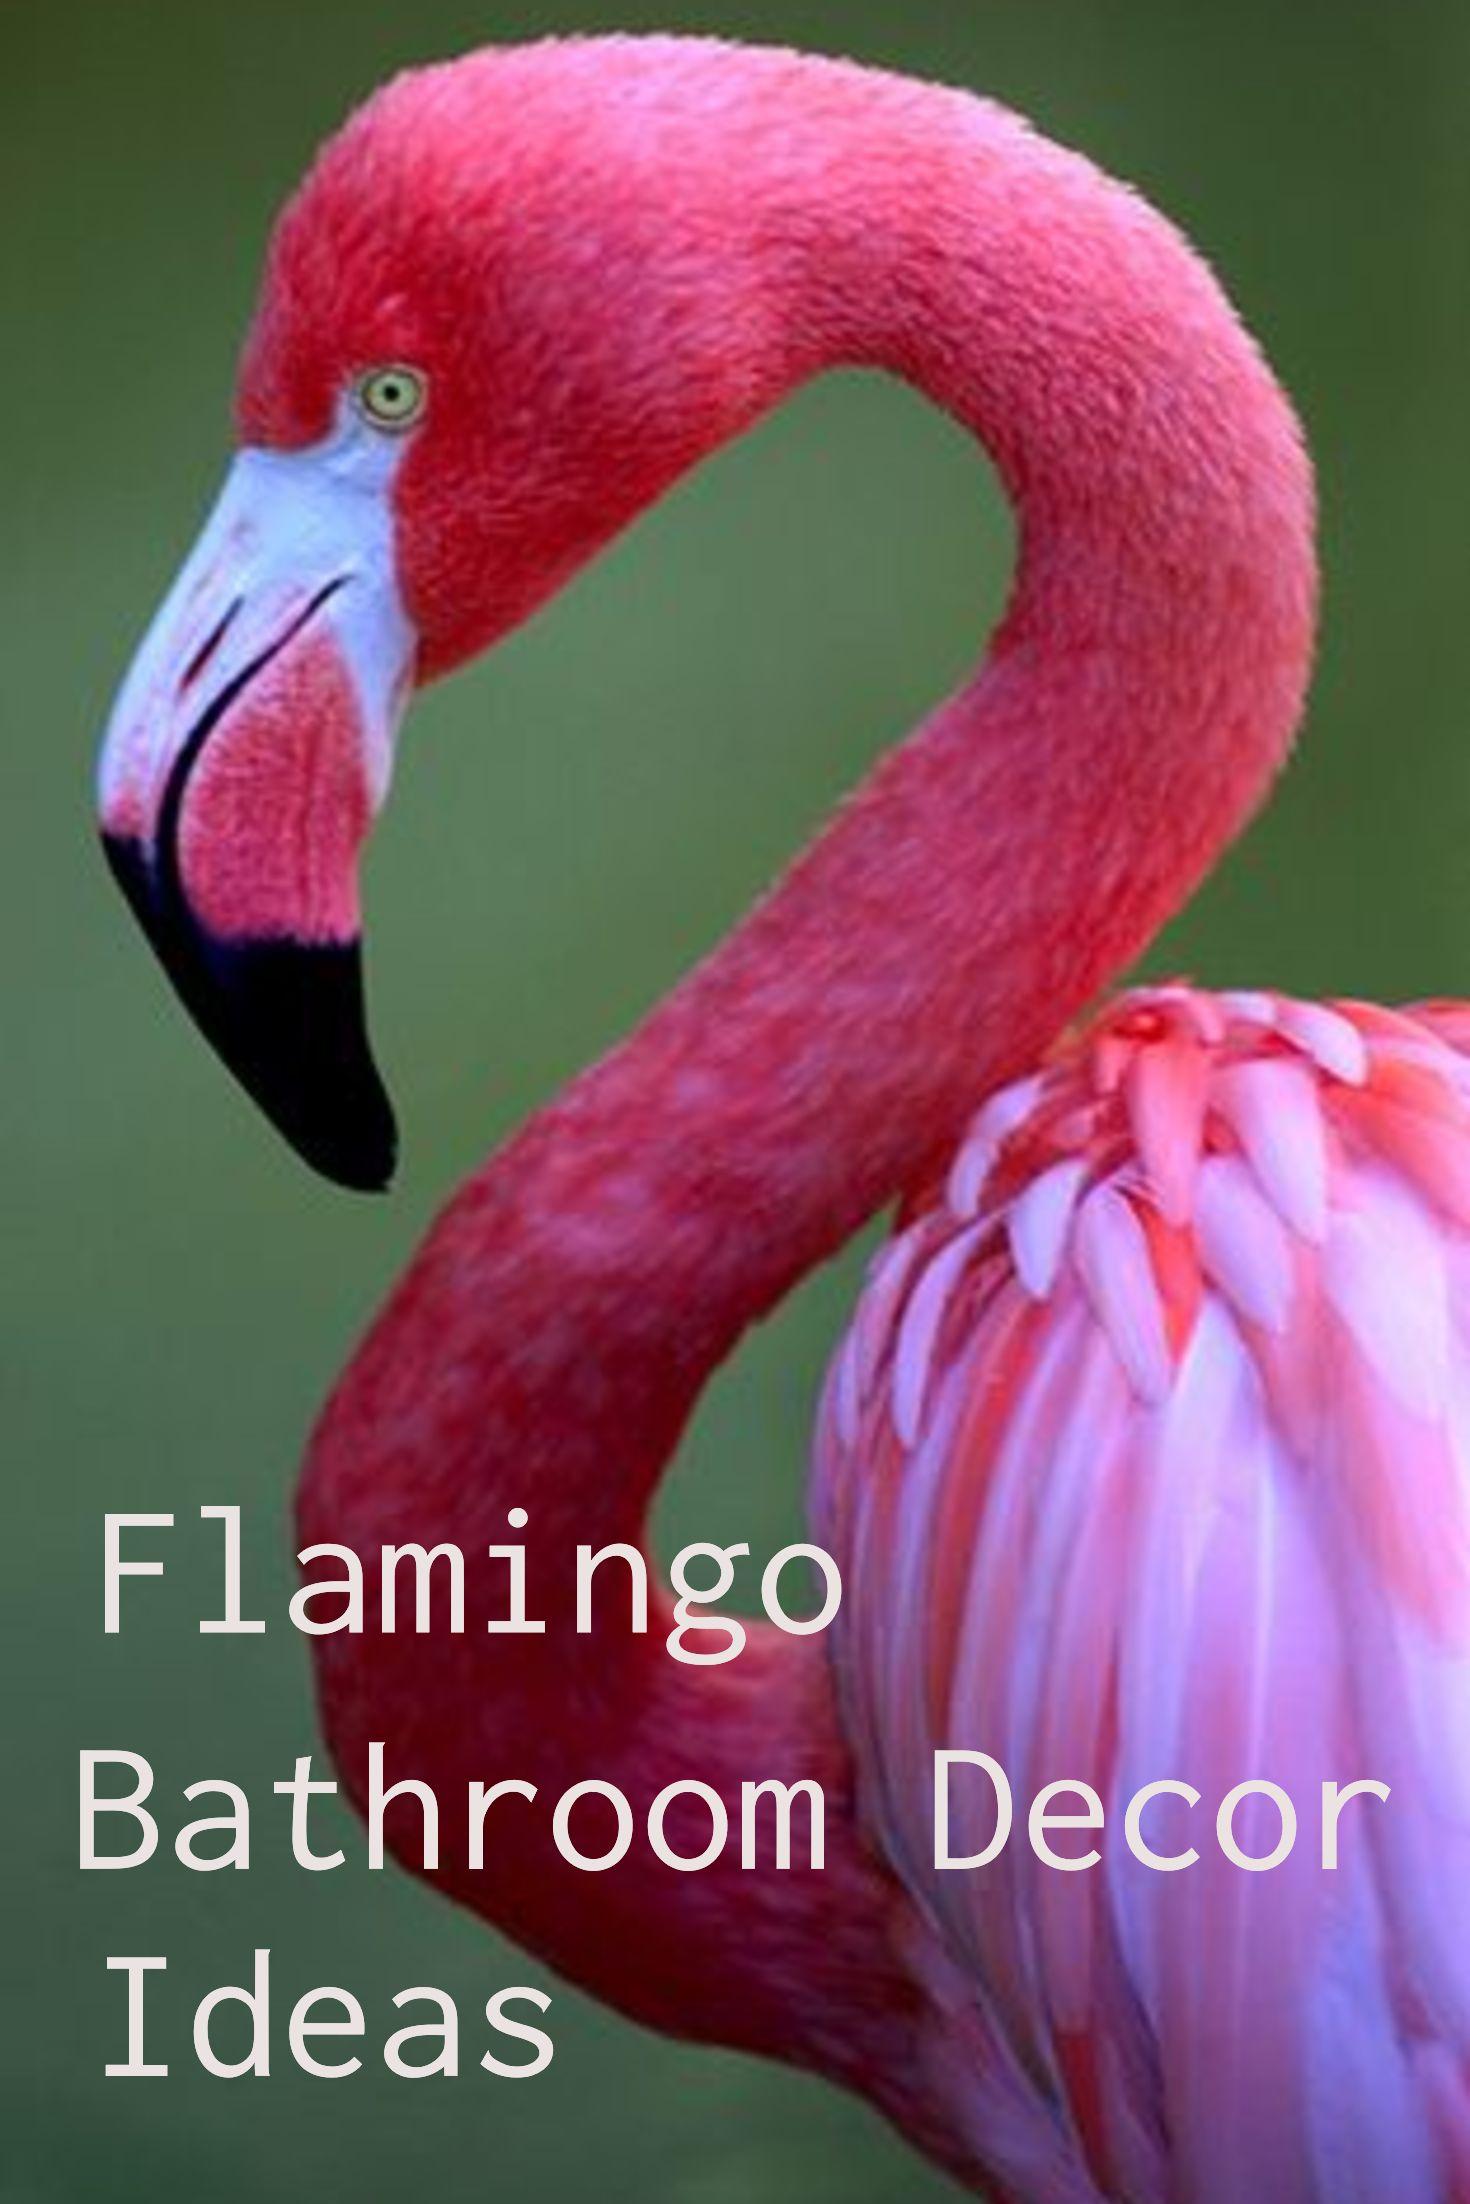 flamingo beautiful pink flamingo bathroom decor - Pink Flamingo Bath Decor